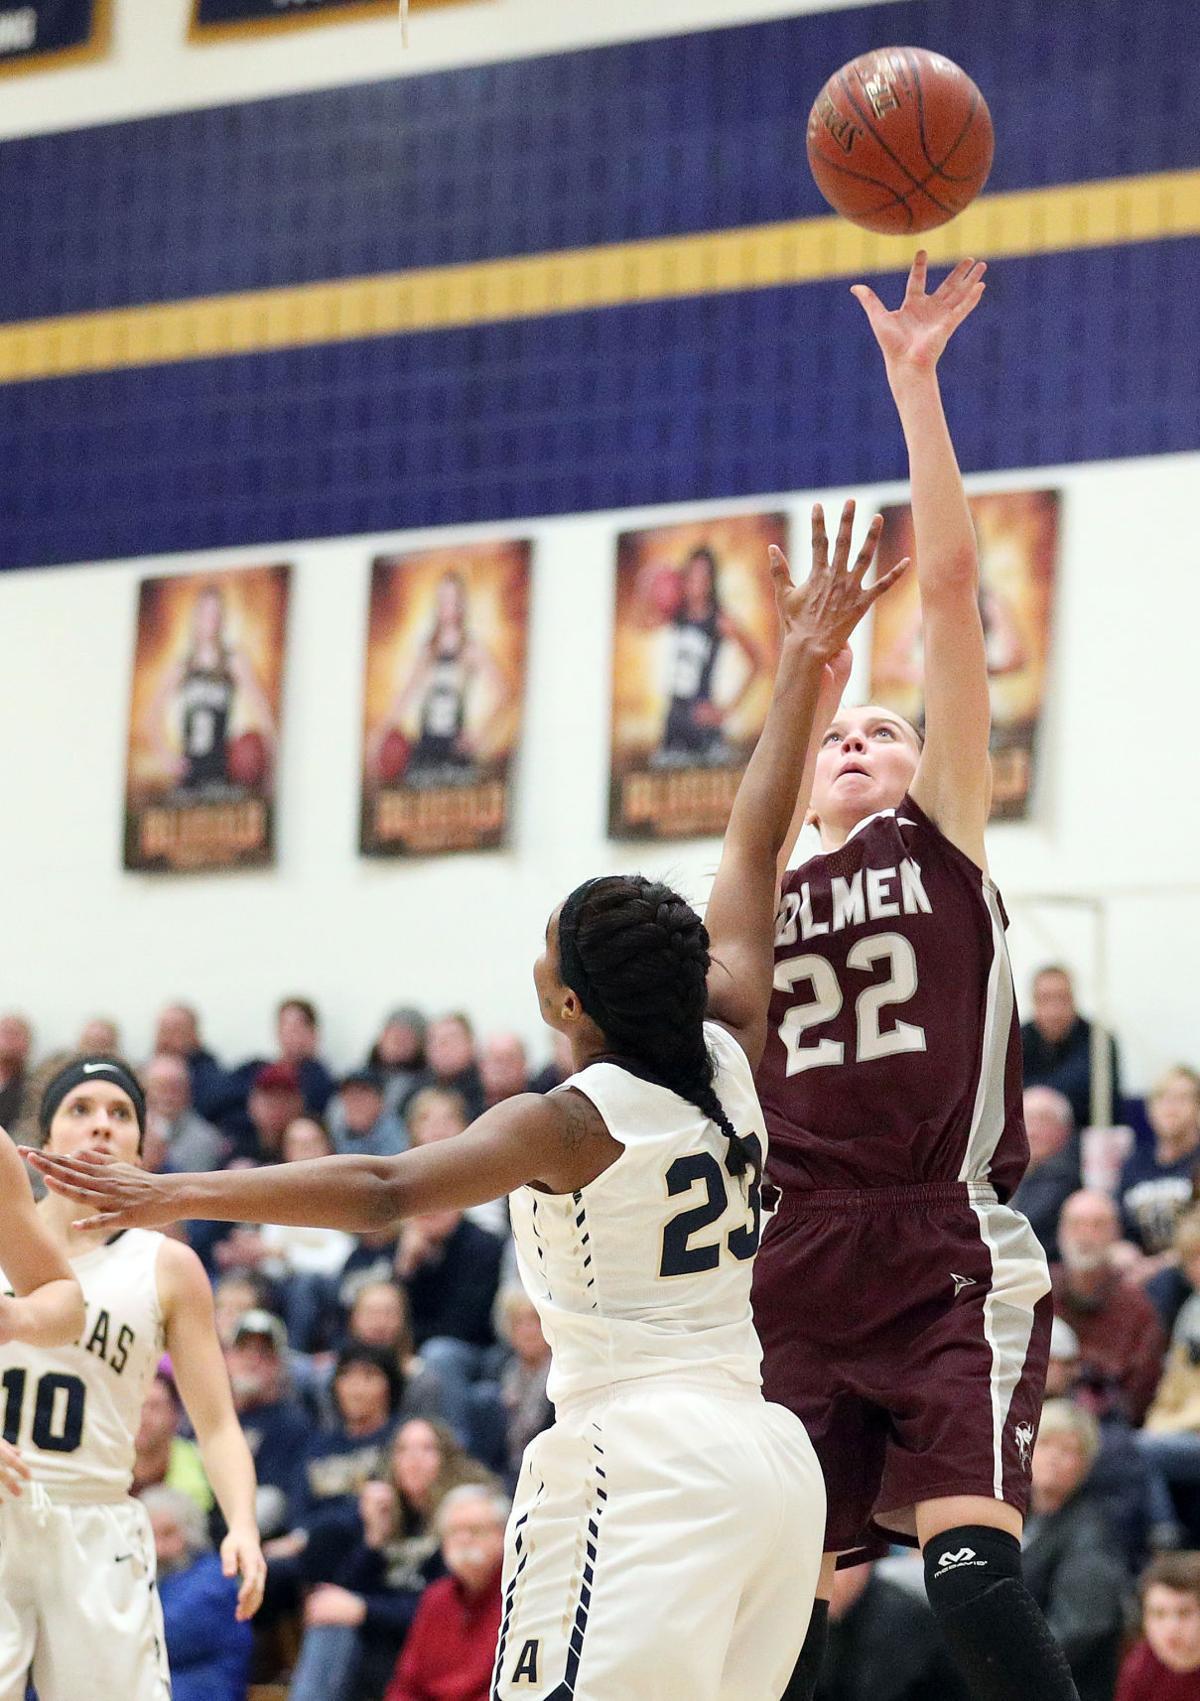 JUMP Aquinas vs. Holmen Girls Basketball